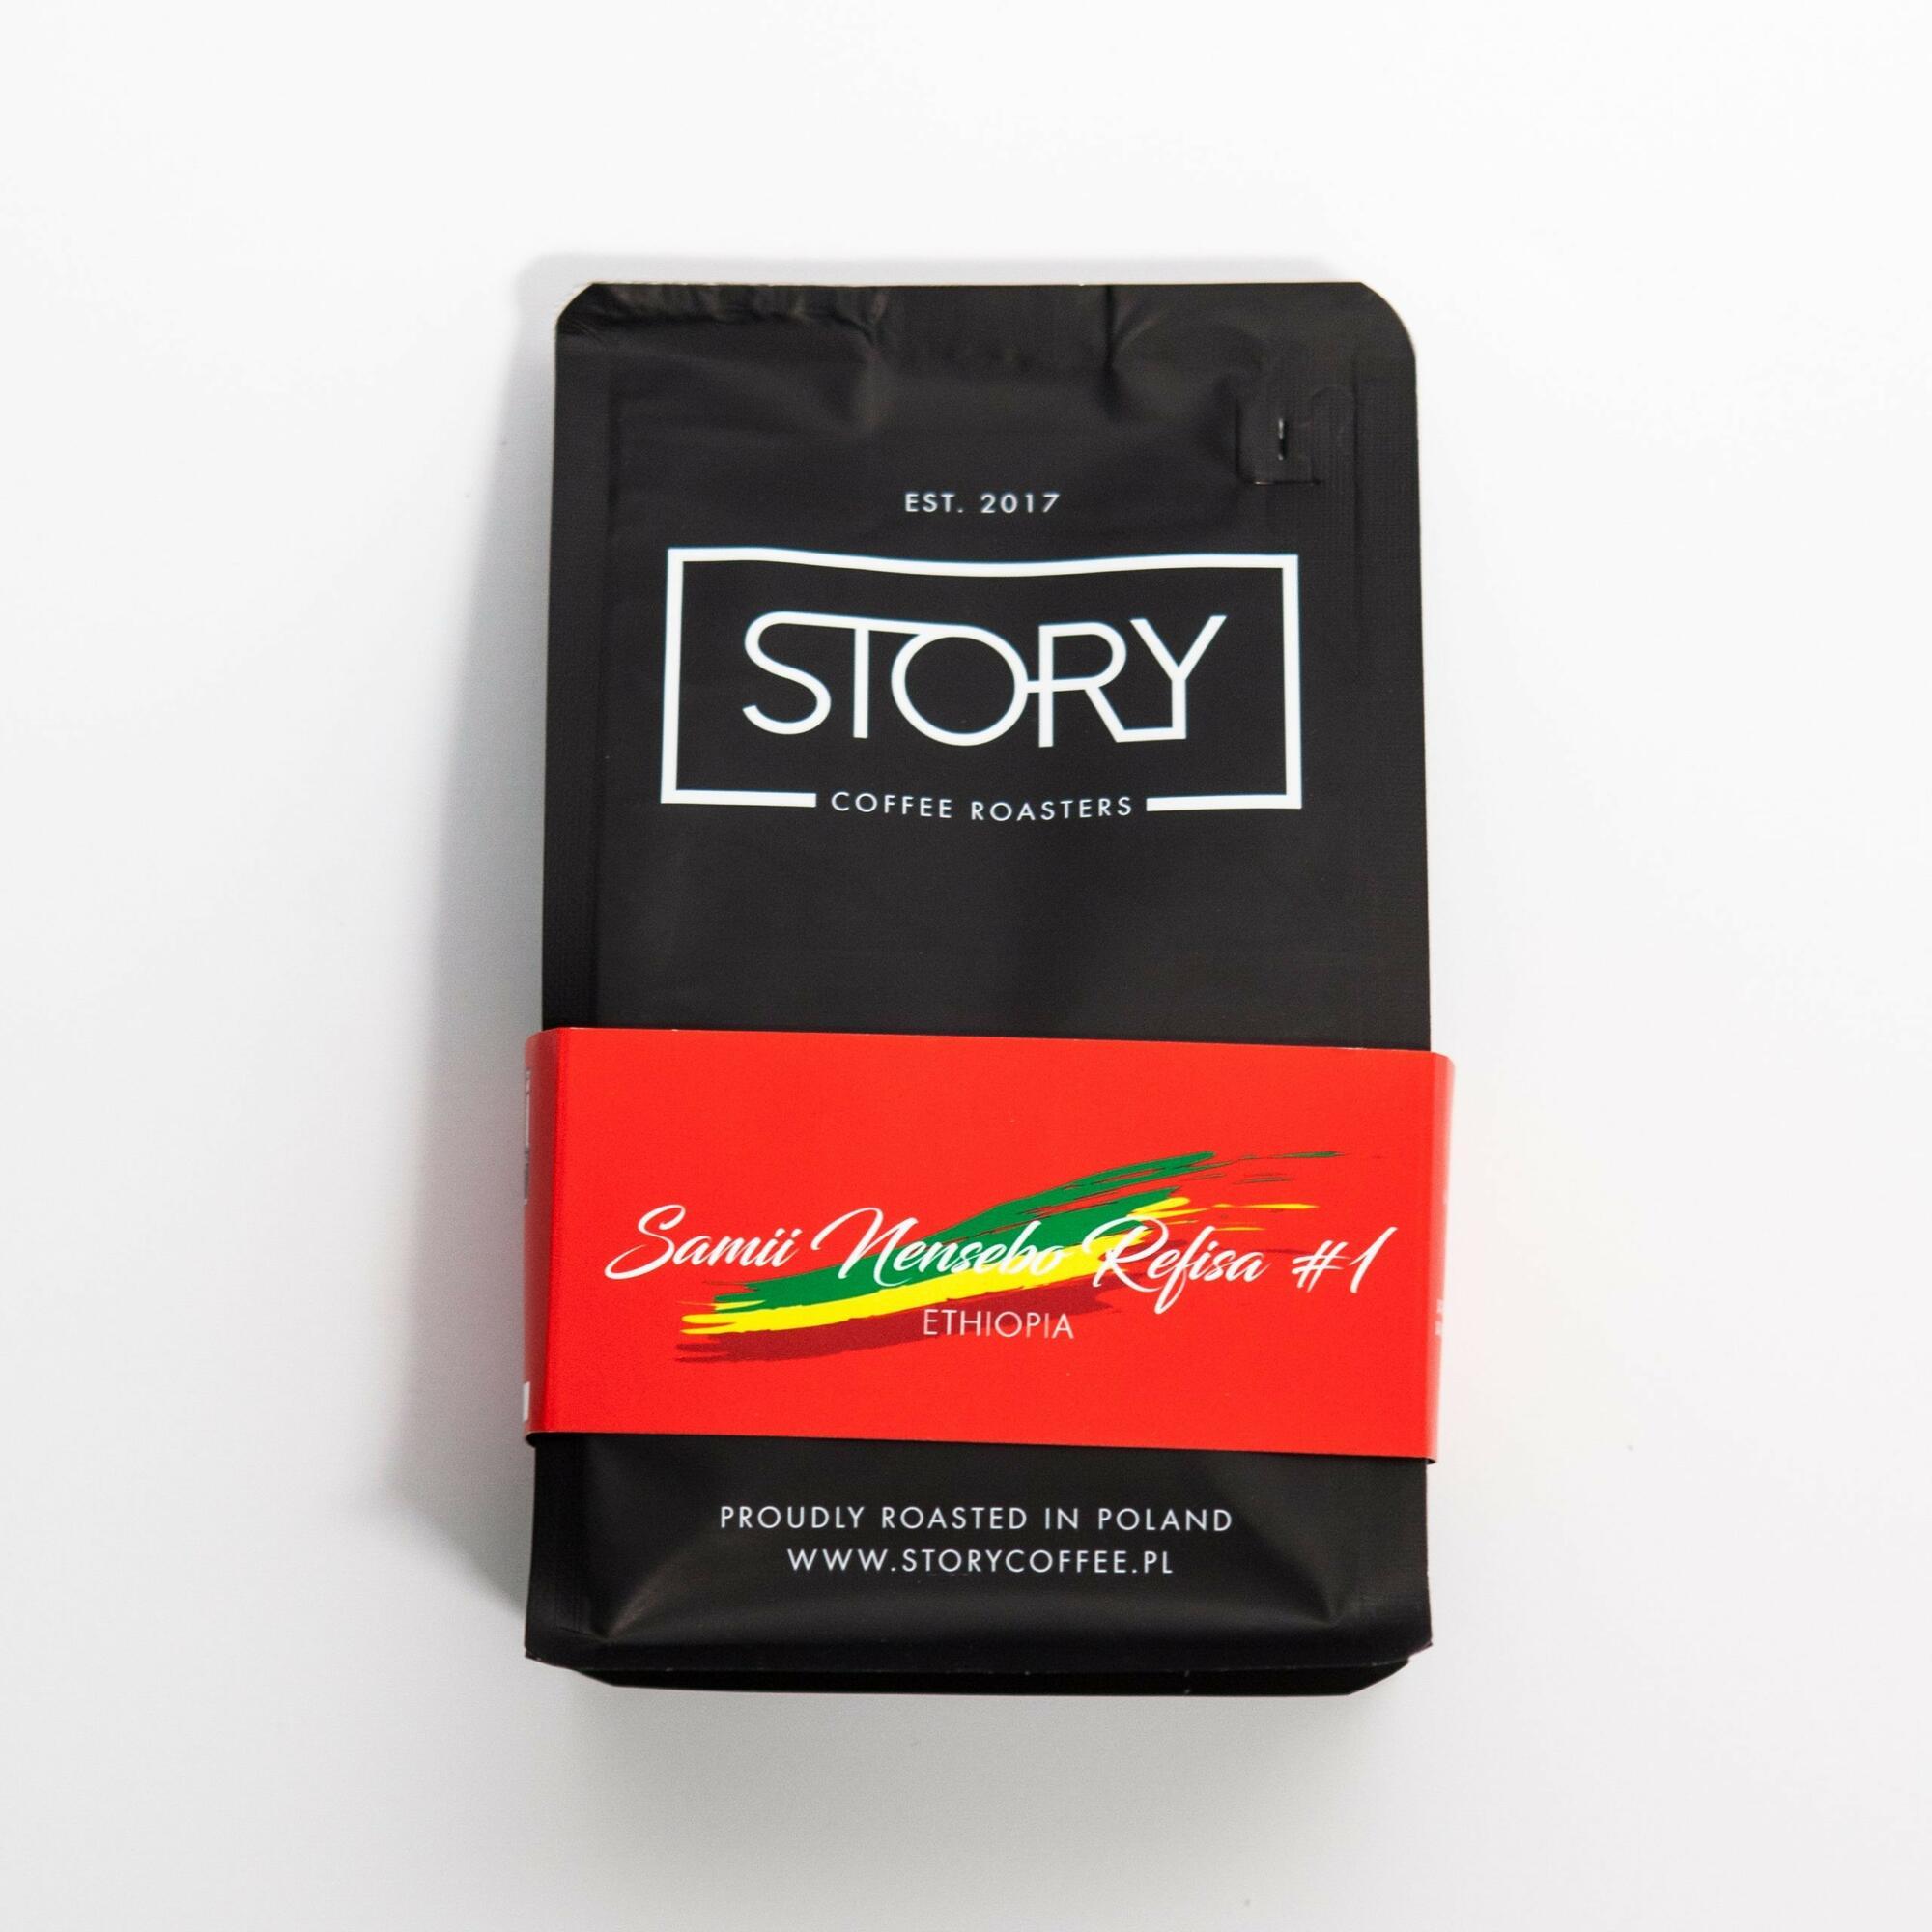 Story Ethiopia Samii Nensebo Refisa #3 250g - Coffee Gang | JestemSlow.pl